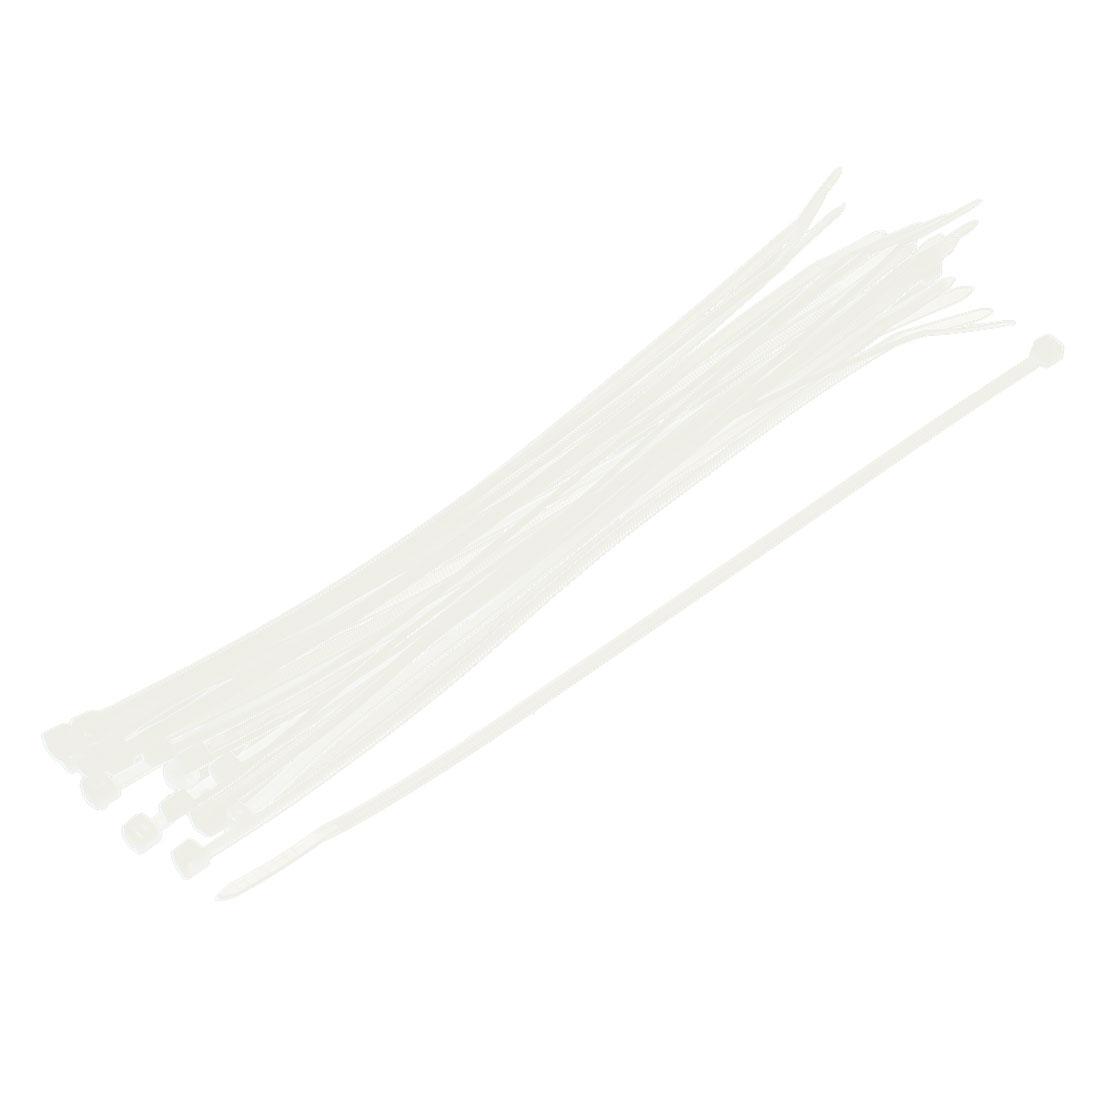 Nylon Self-Locking Zip Trim Wrap Cable Wire Tie Loop 3mm x 200mm 20Pcs